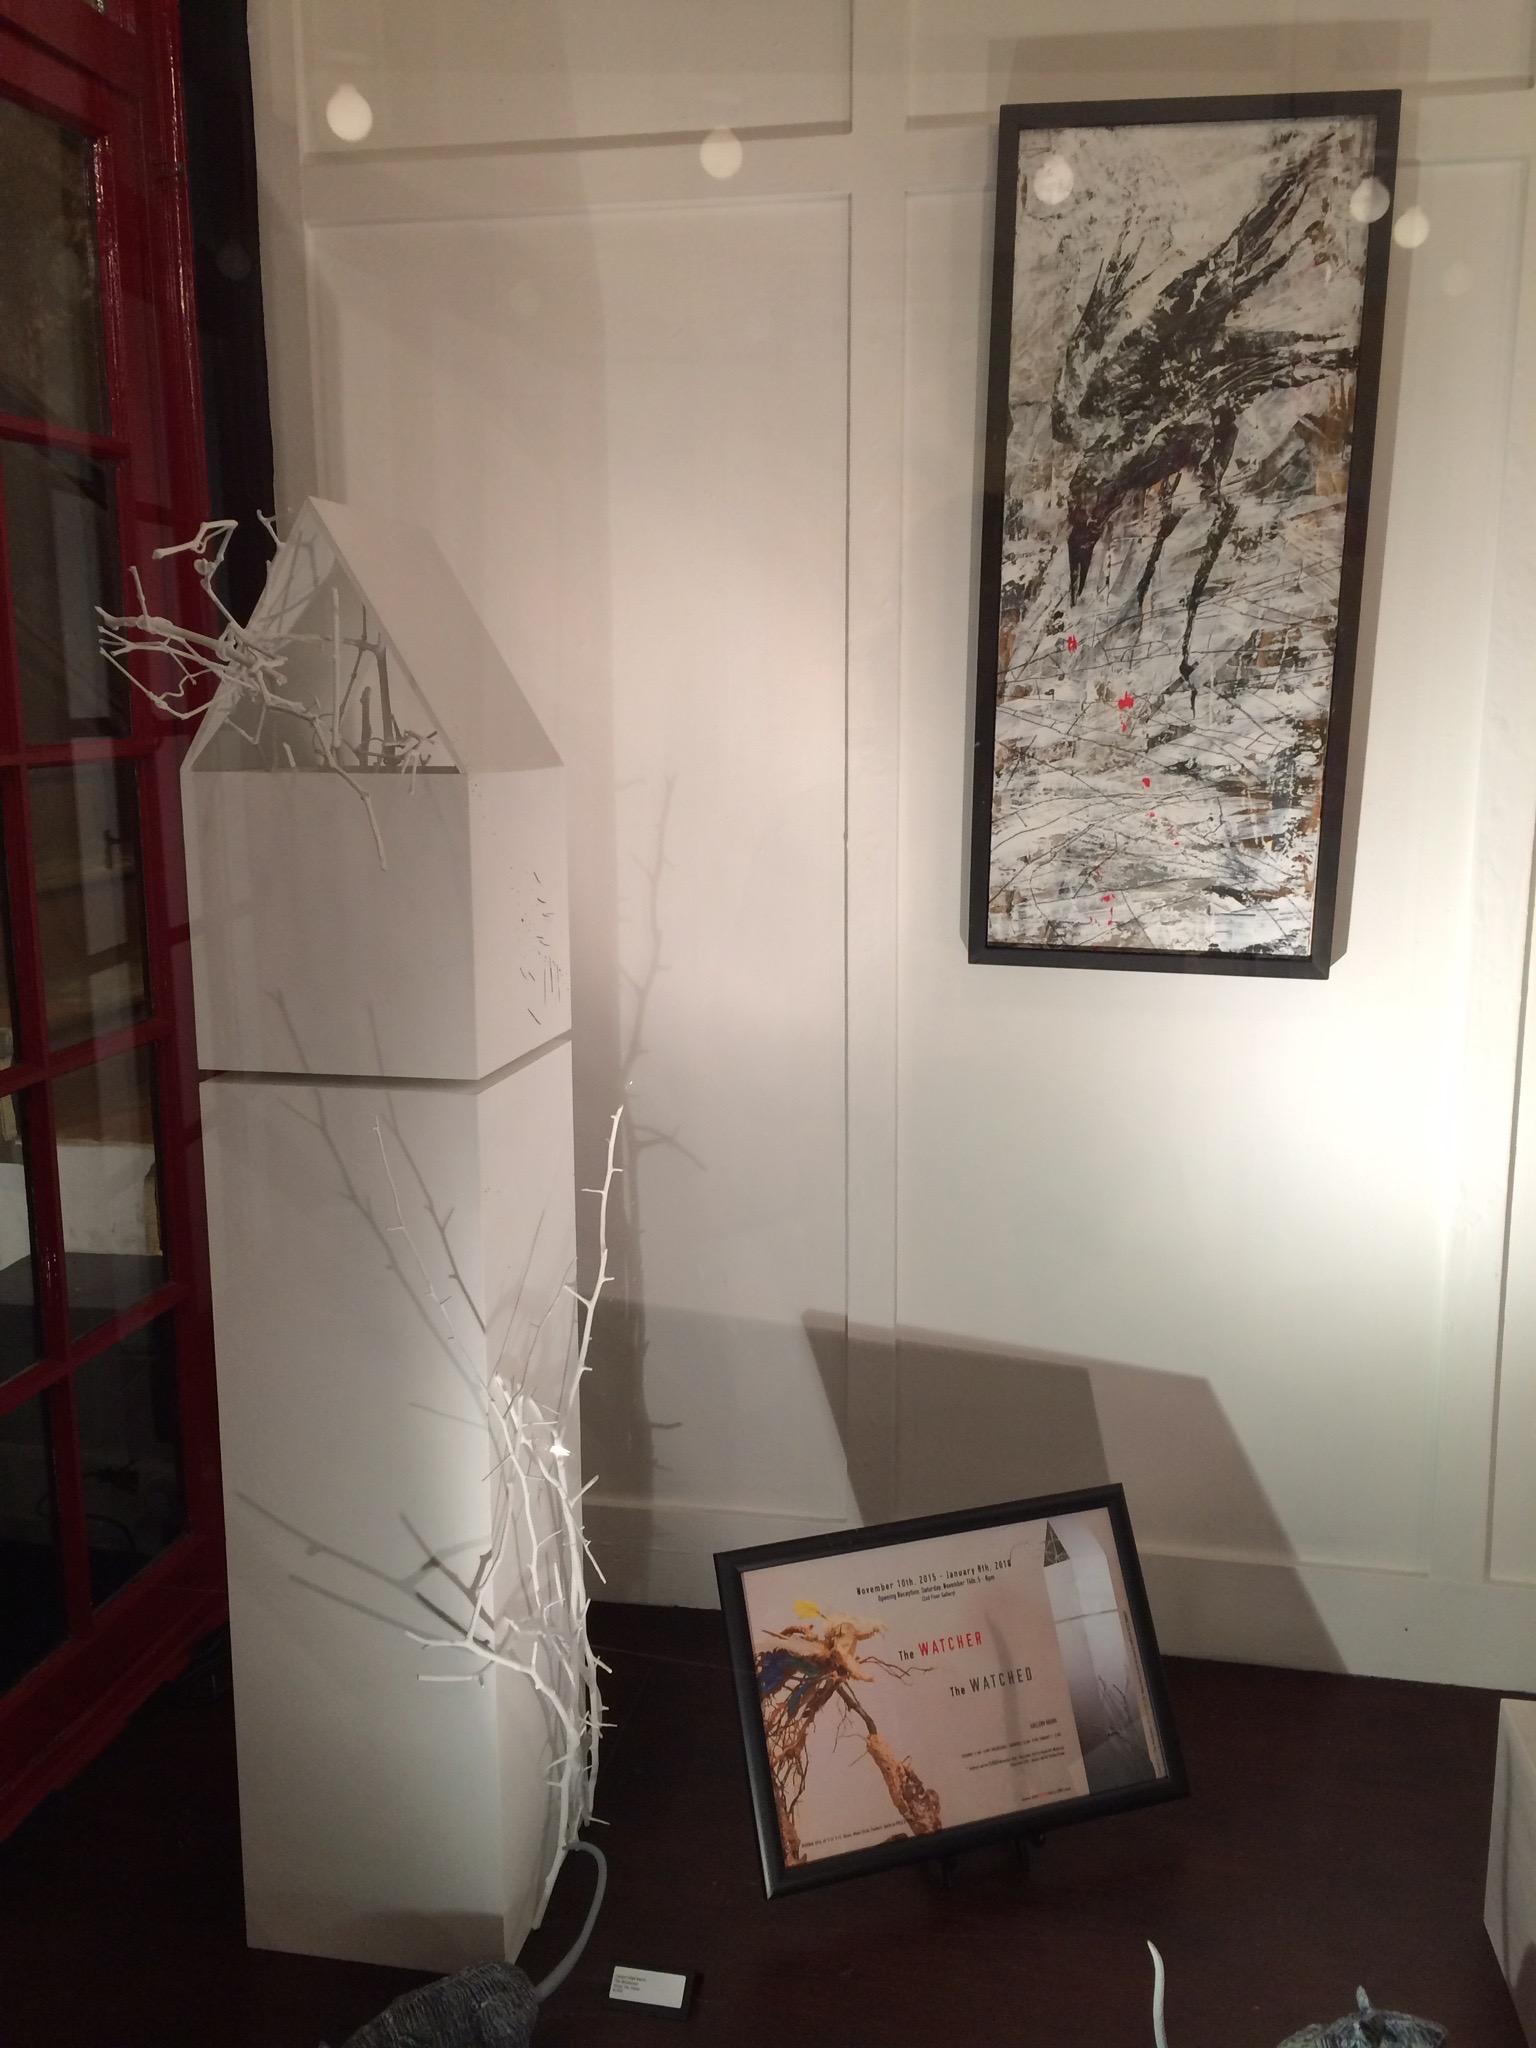 The Woodsman. Wood, sticks, gesso, acrylic ink. Irina Koukhanova's Rats snooping alongside, and Irina's work on the wall.